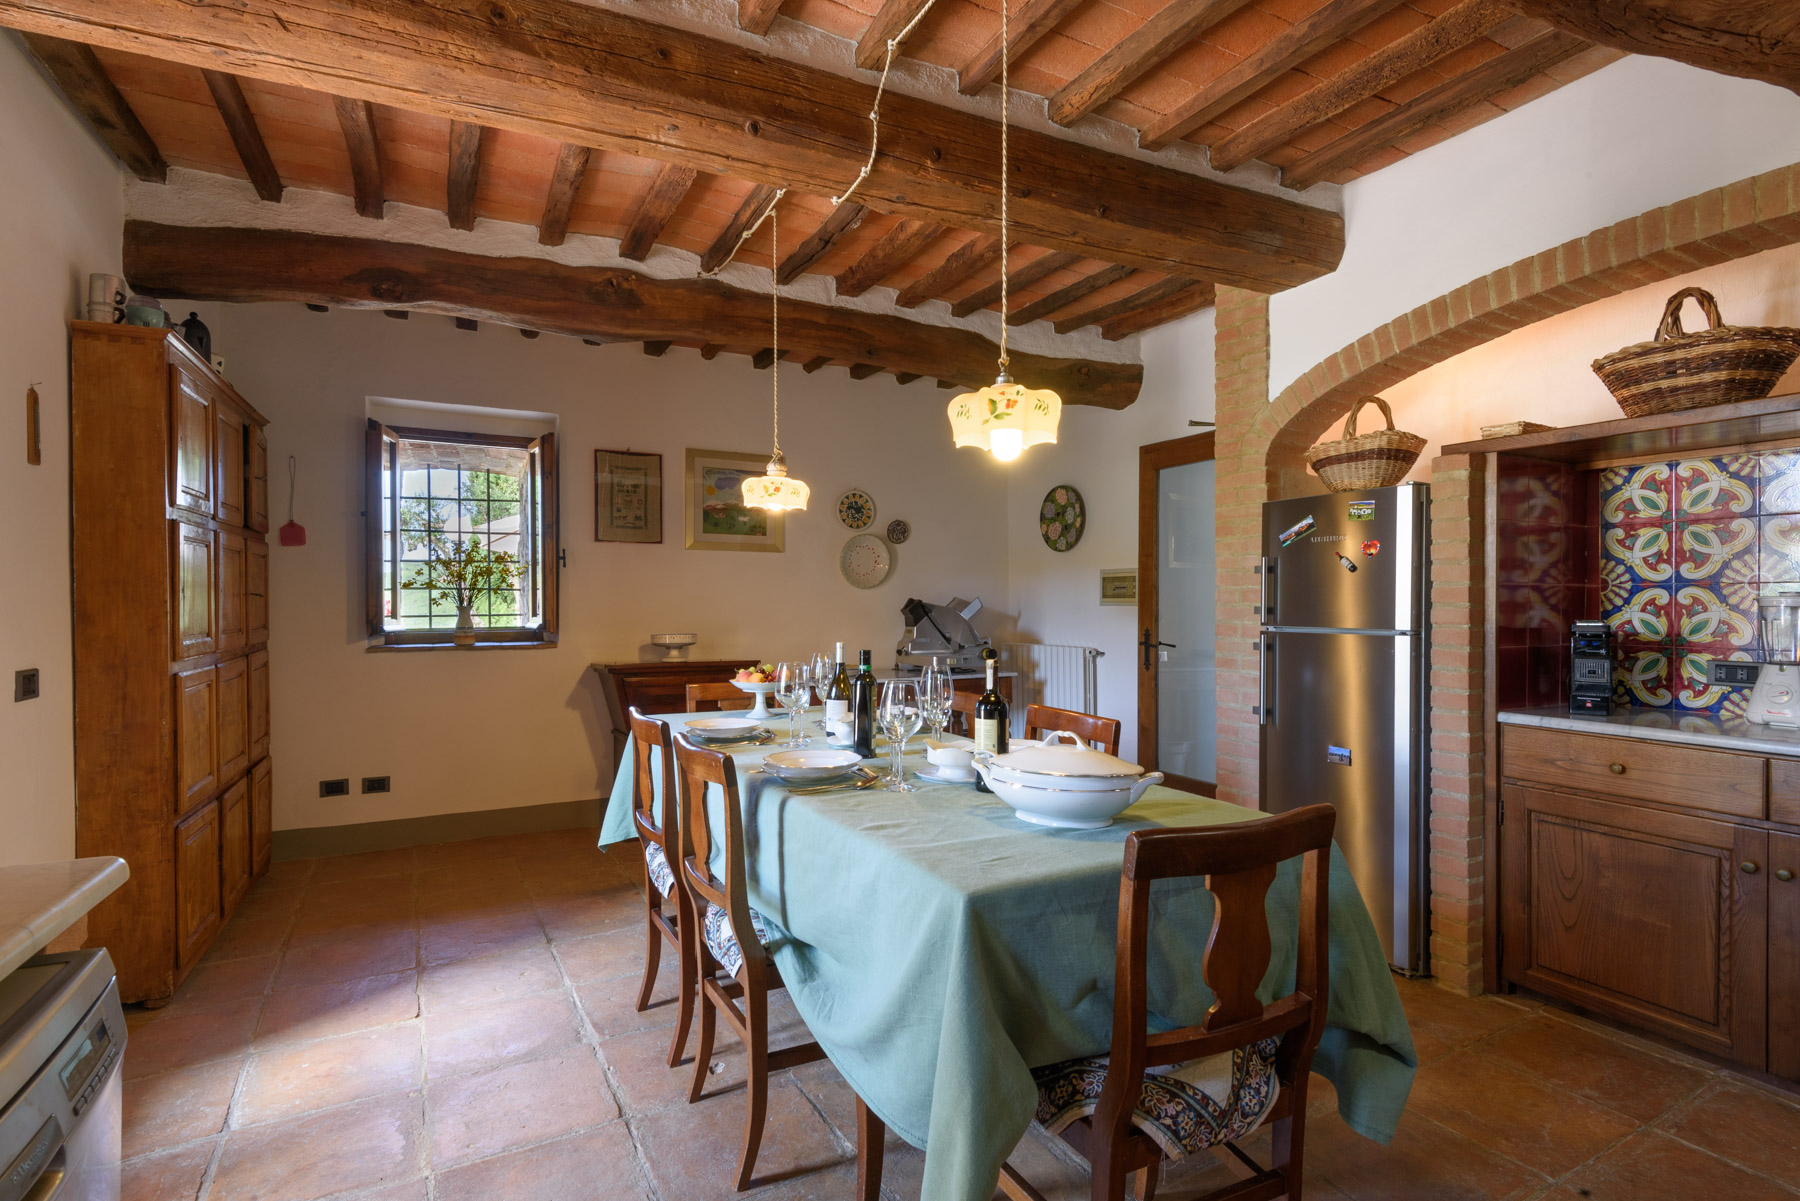 Rustico in Vendita a Castellina In Chianti: 5 locali, 650 mq - Foto 10